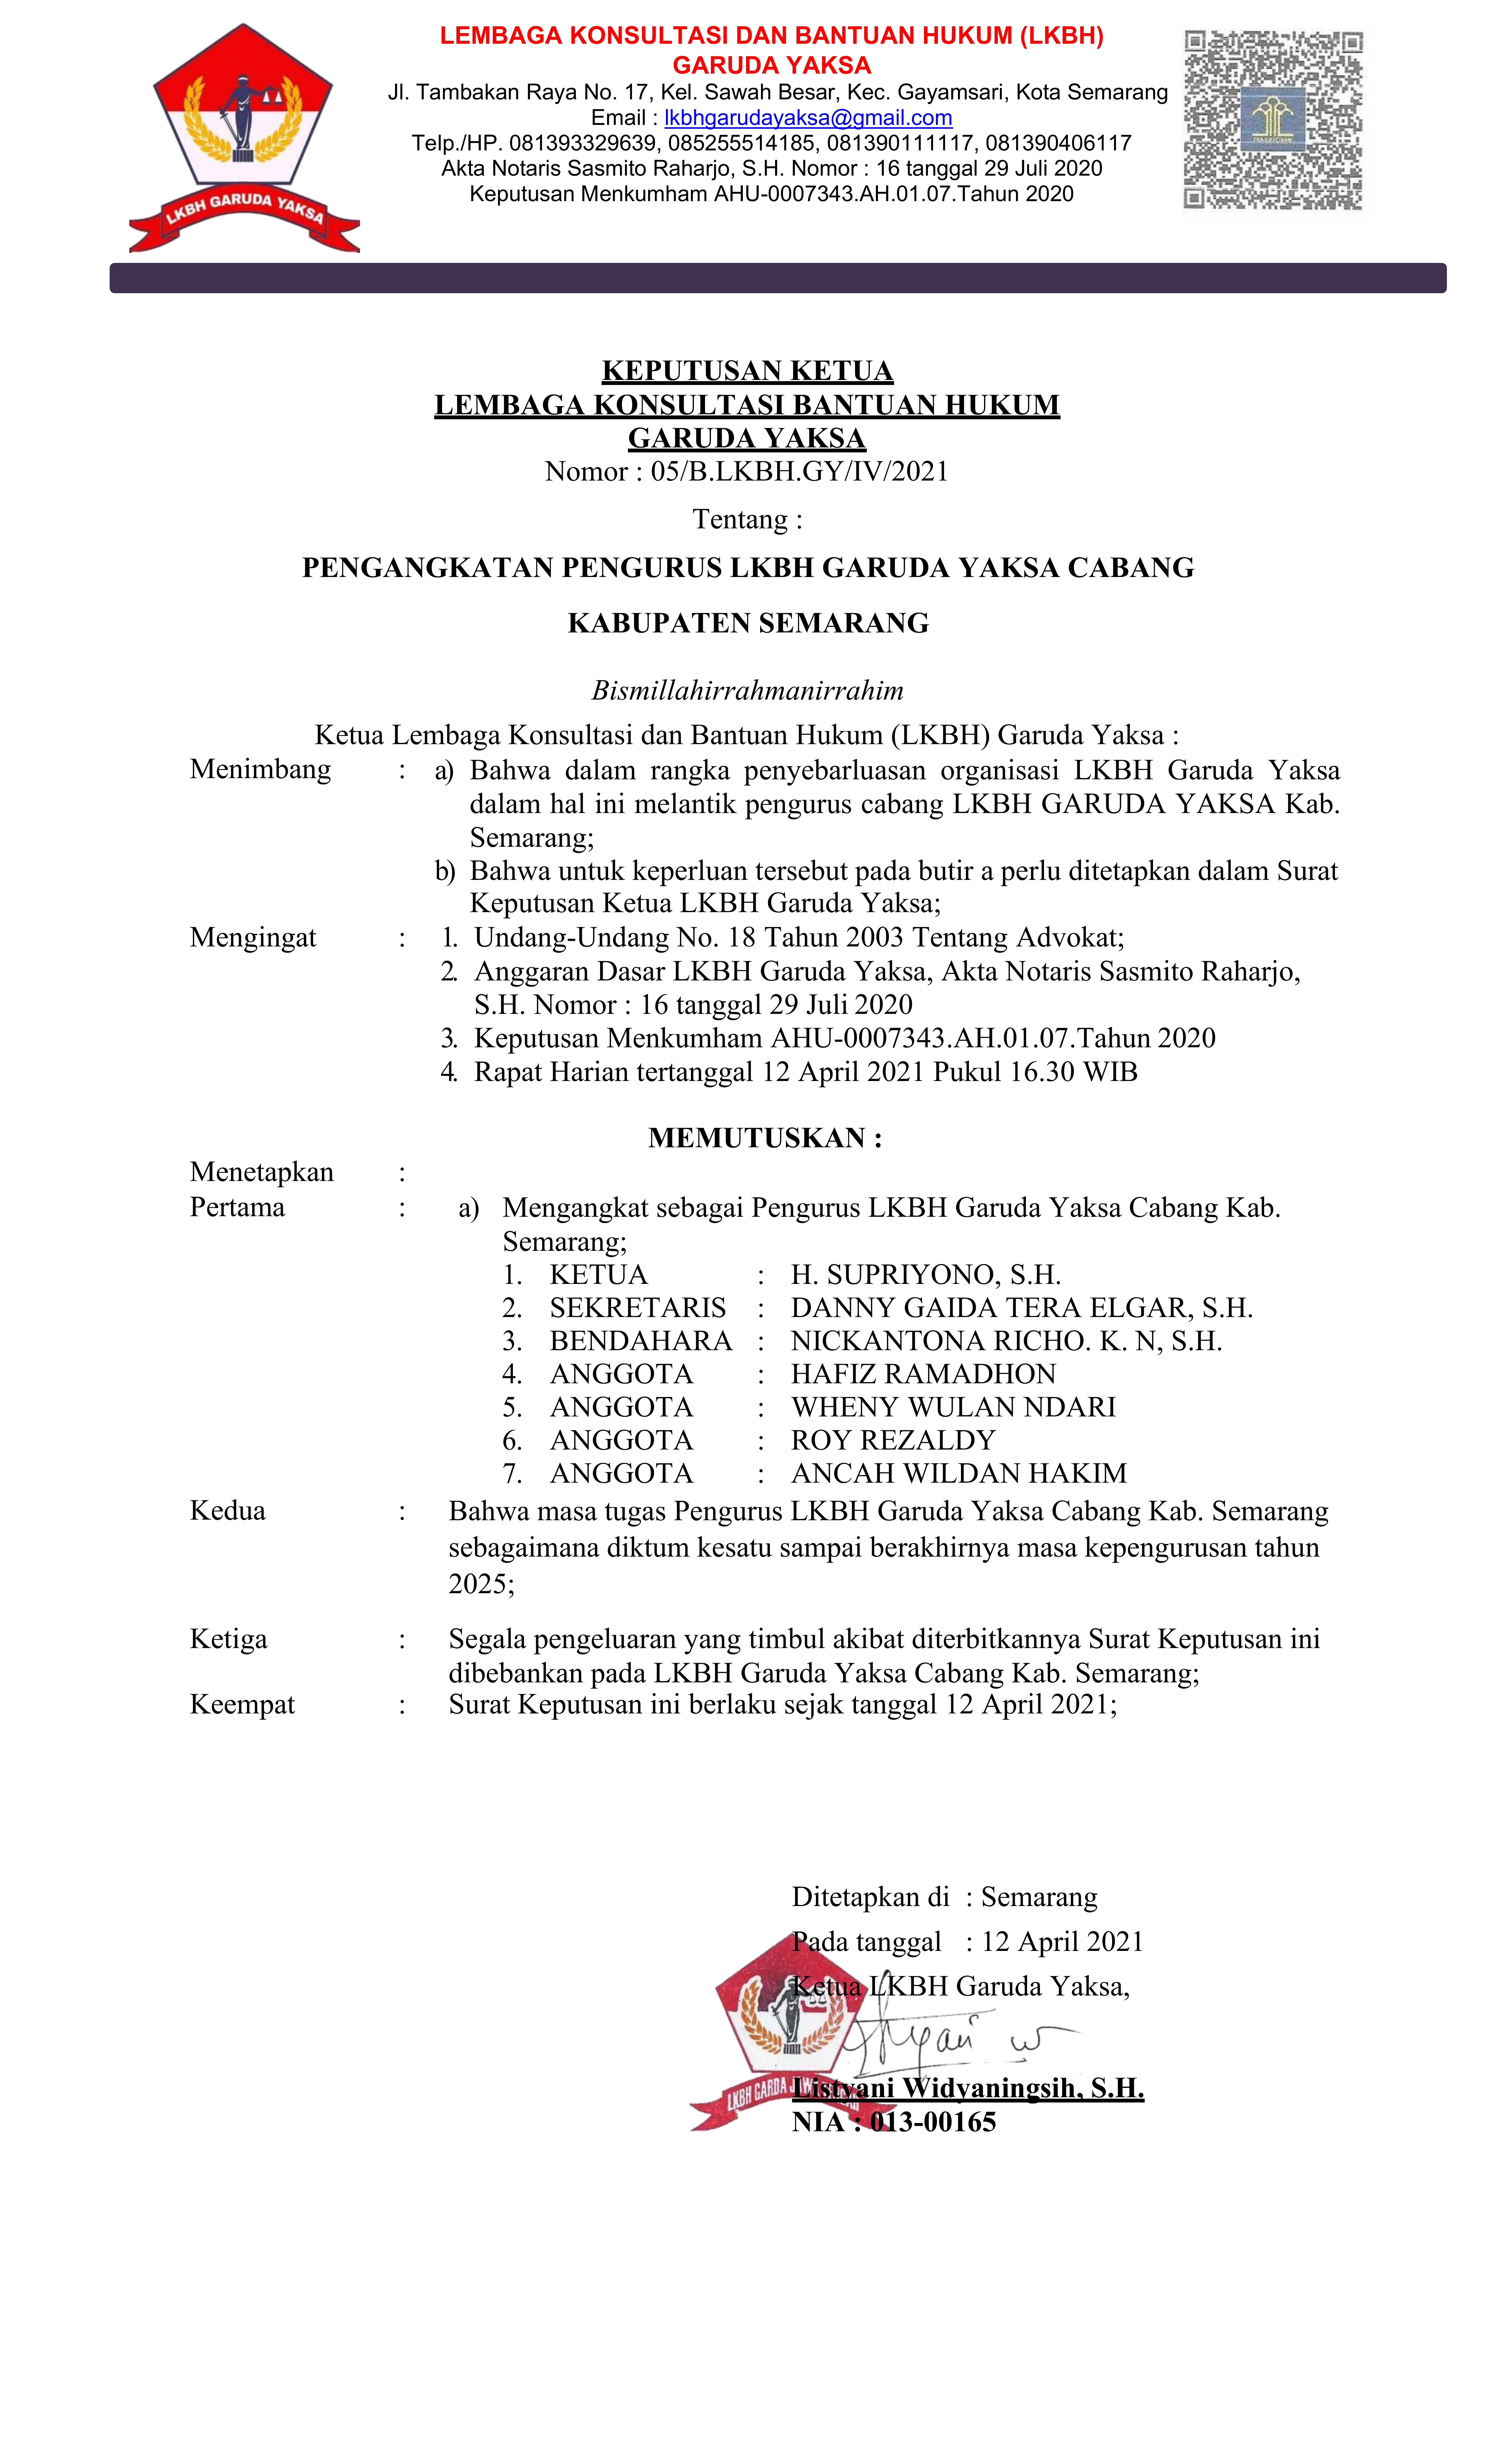 Surat Keputusan (SK) Pengangkatan Pengurus Lembaga Konsultasi dan Bantuan Hukum (LKBH) Garuda Yaksa Kabupaten Semarang, Provinsi Jawa Tengah.